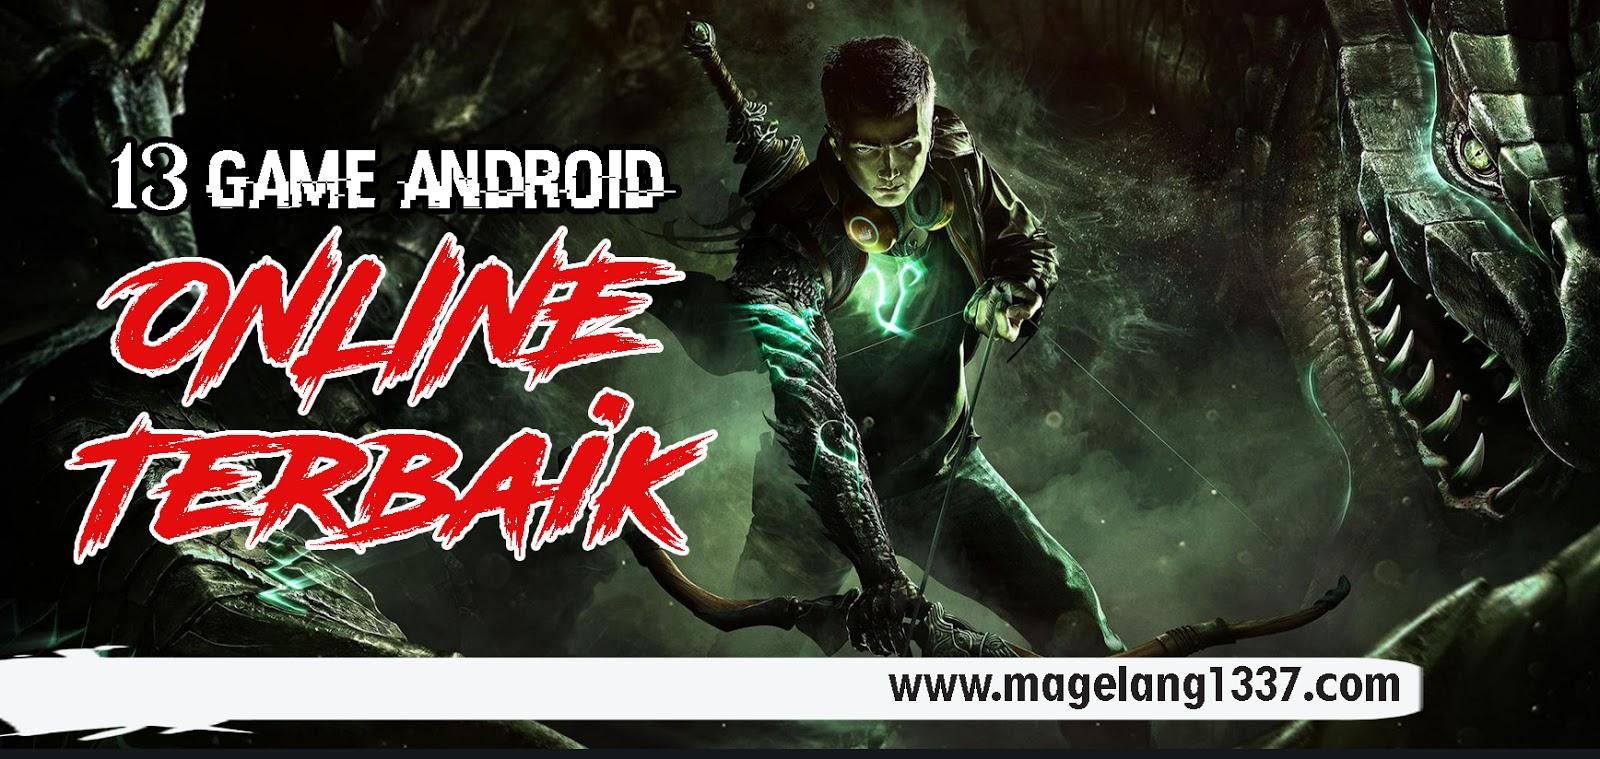 13-game-android-online-terbaik-2019